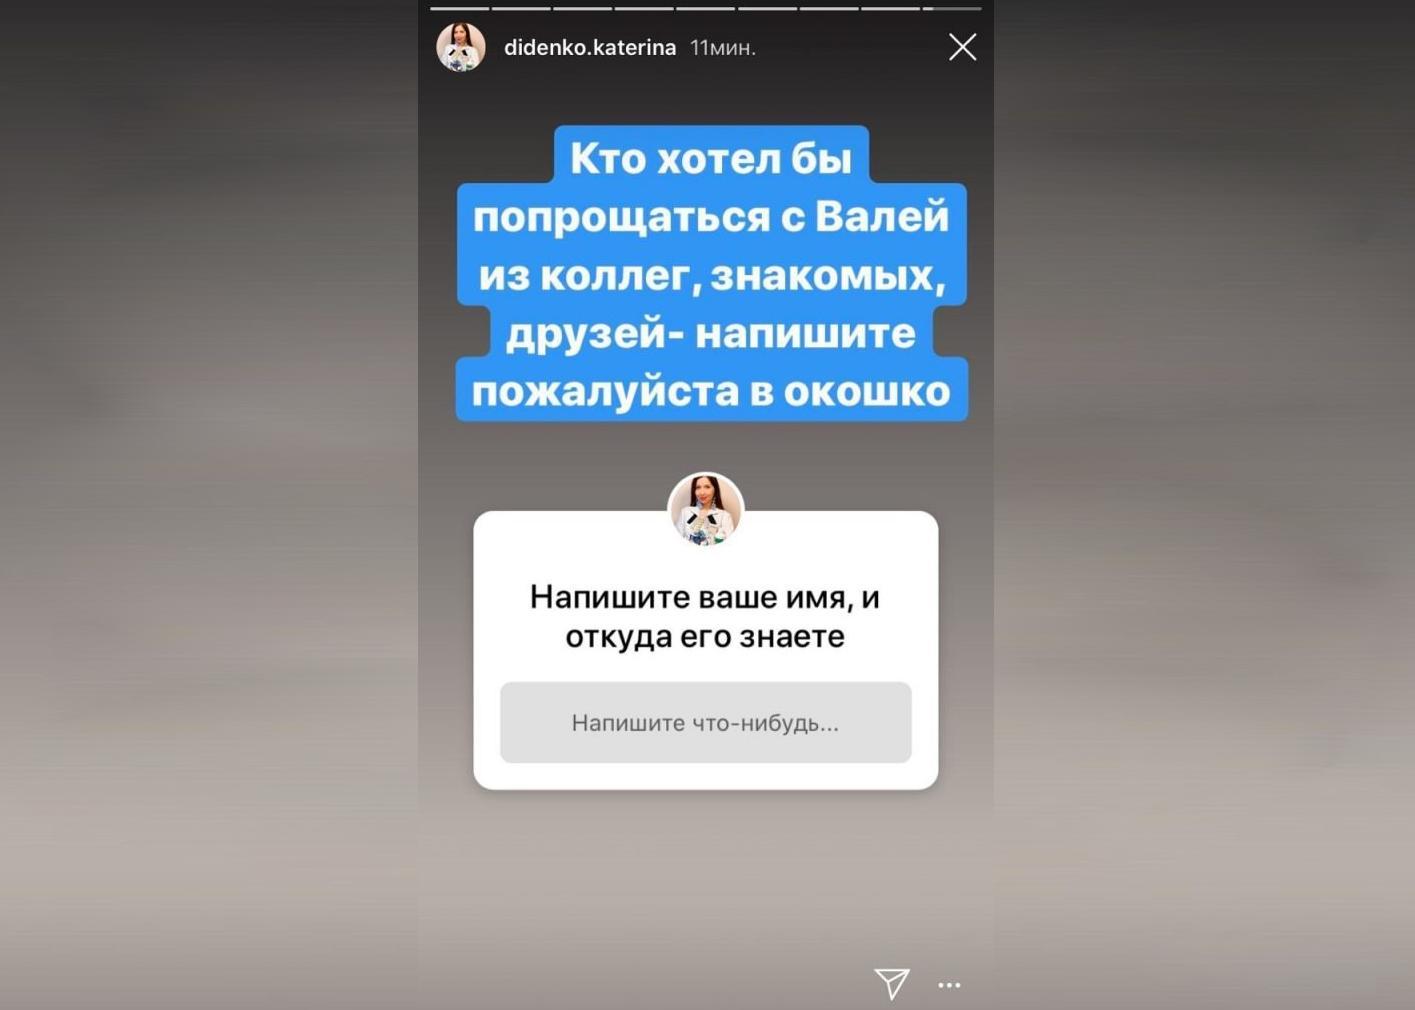 Скриншот © Instagram / didenko.katerina